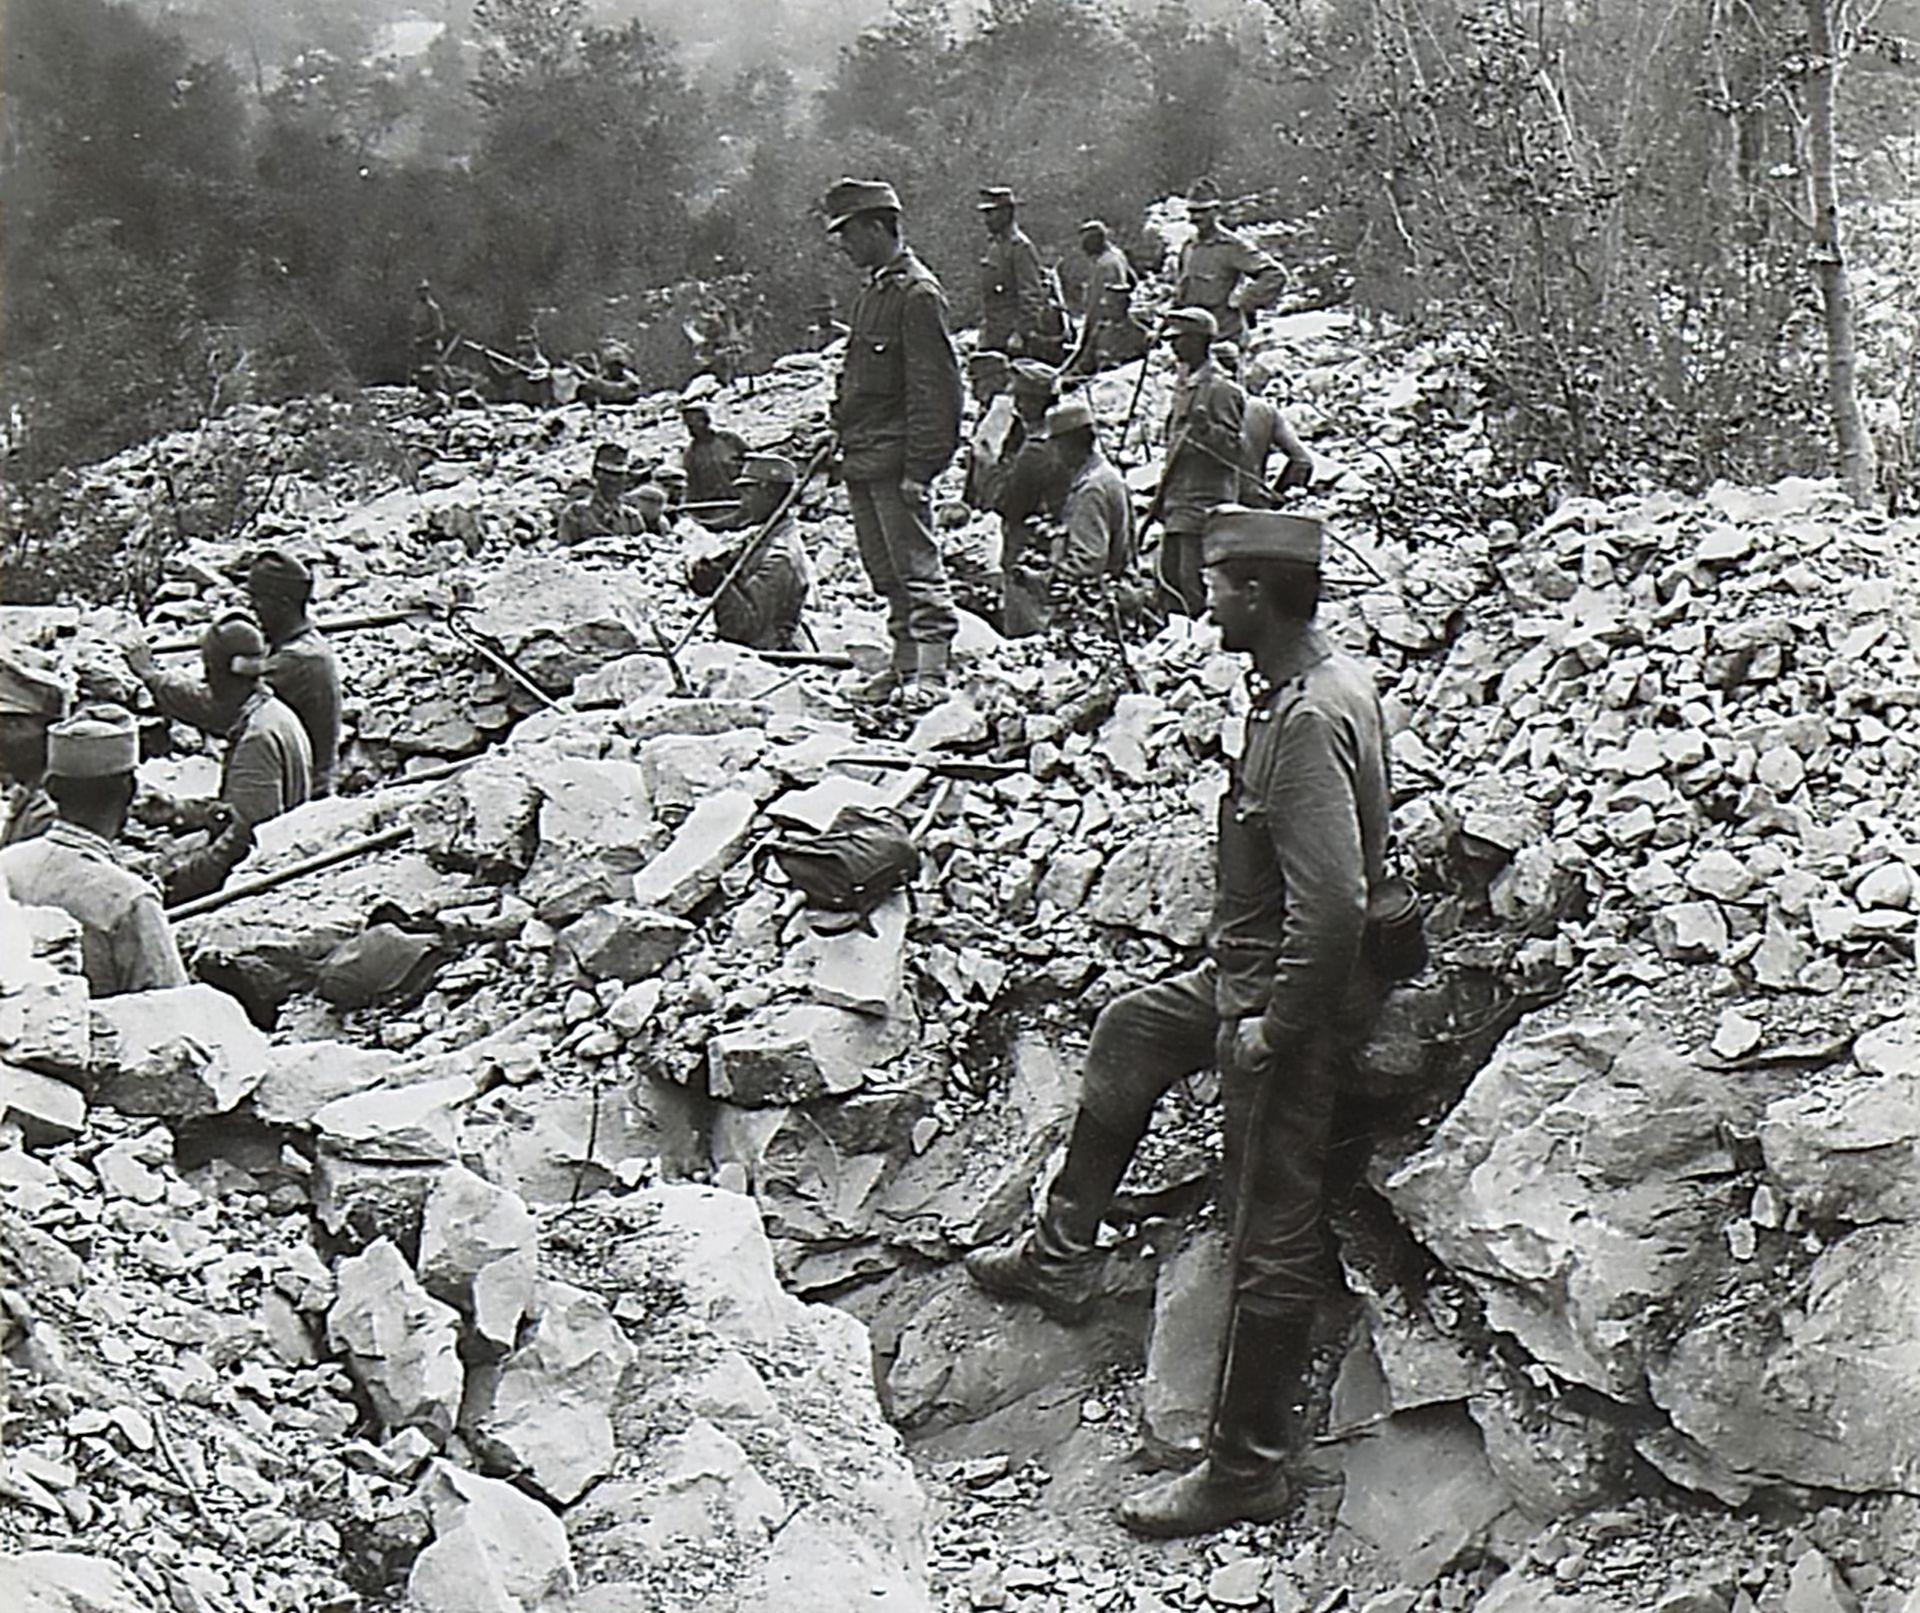 FELJTON Potresni zapisi mladog Hrvata u uniformi Austro-ugarske monarhije